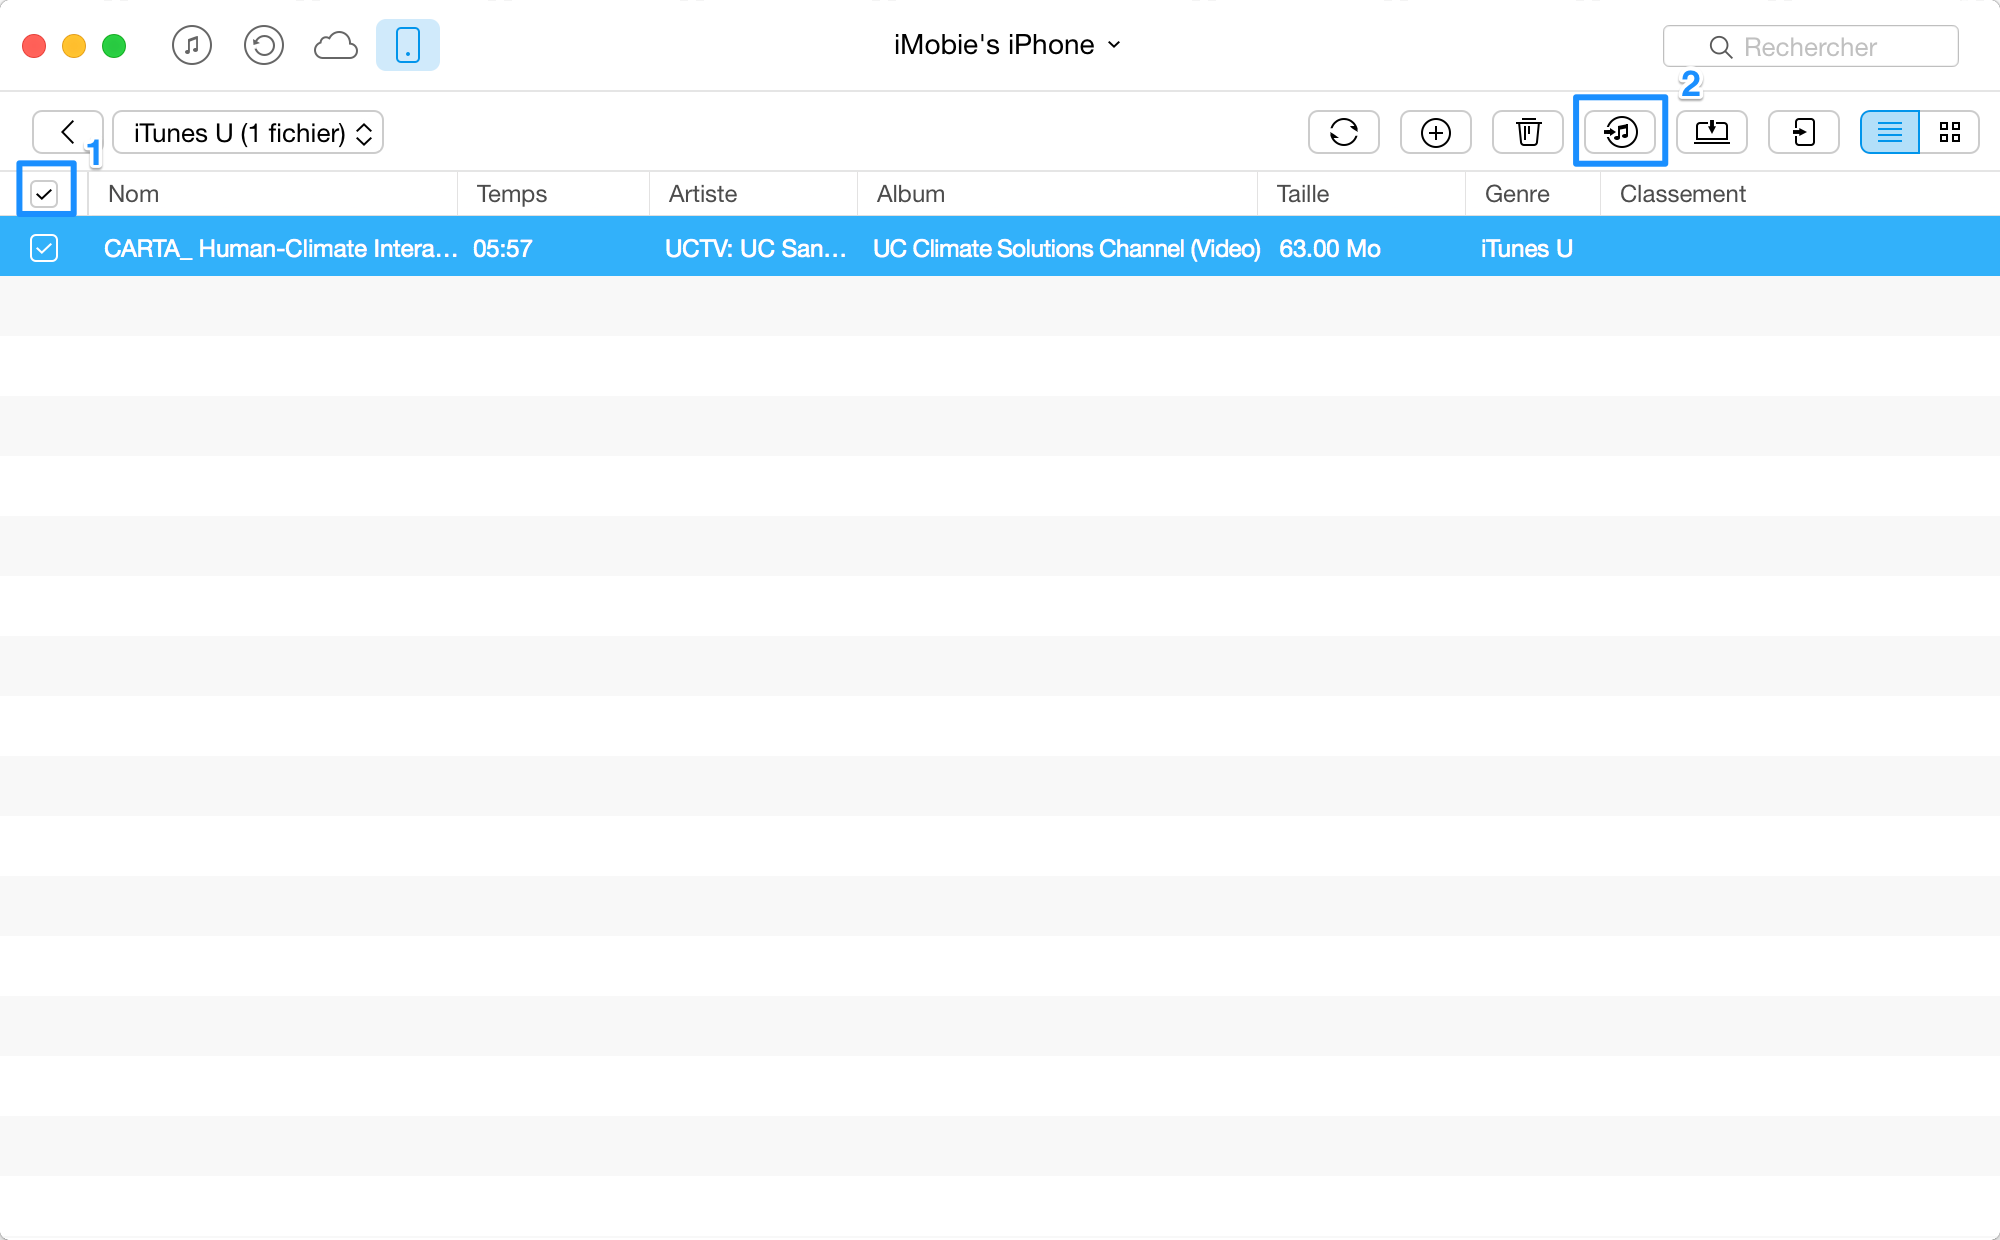 Transférer iTunes U de l'iPhone à iTunes avec AnyTrans - étape 3